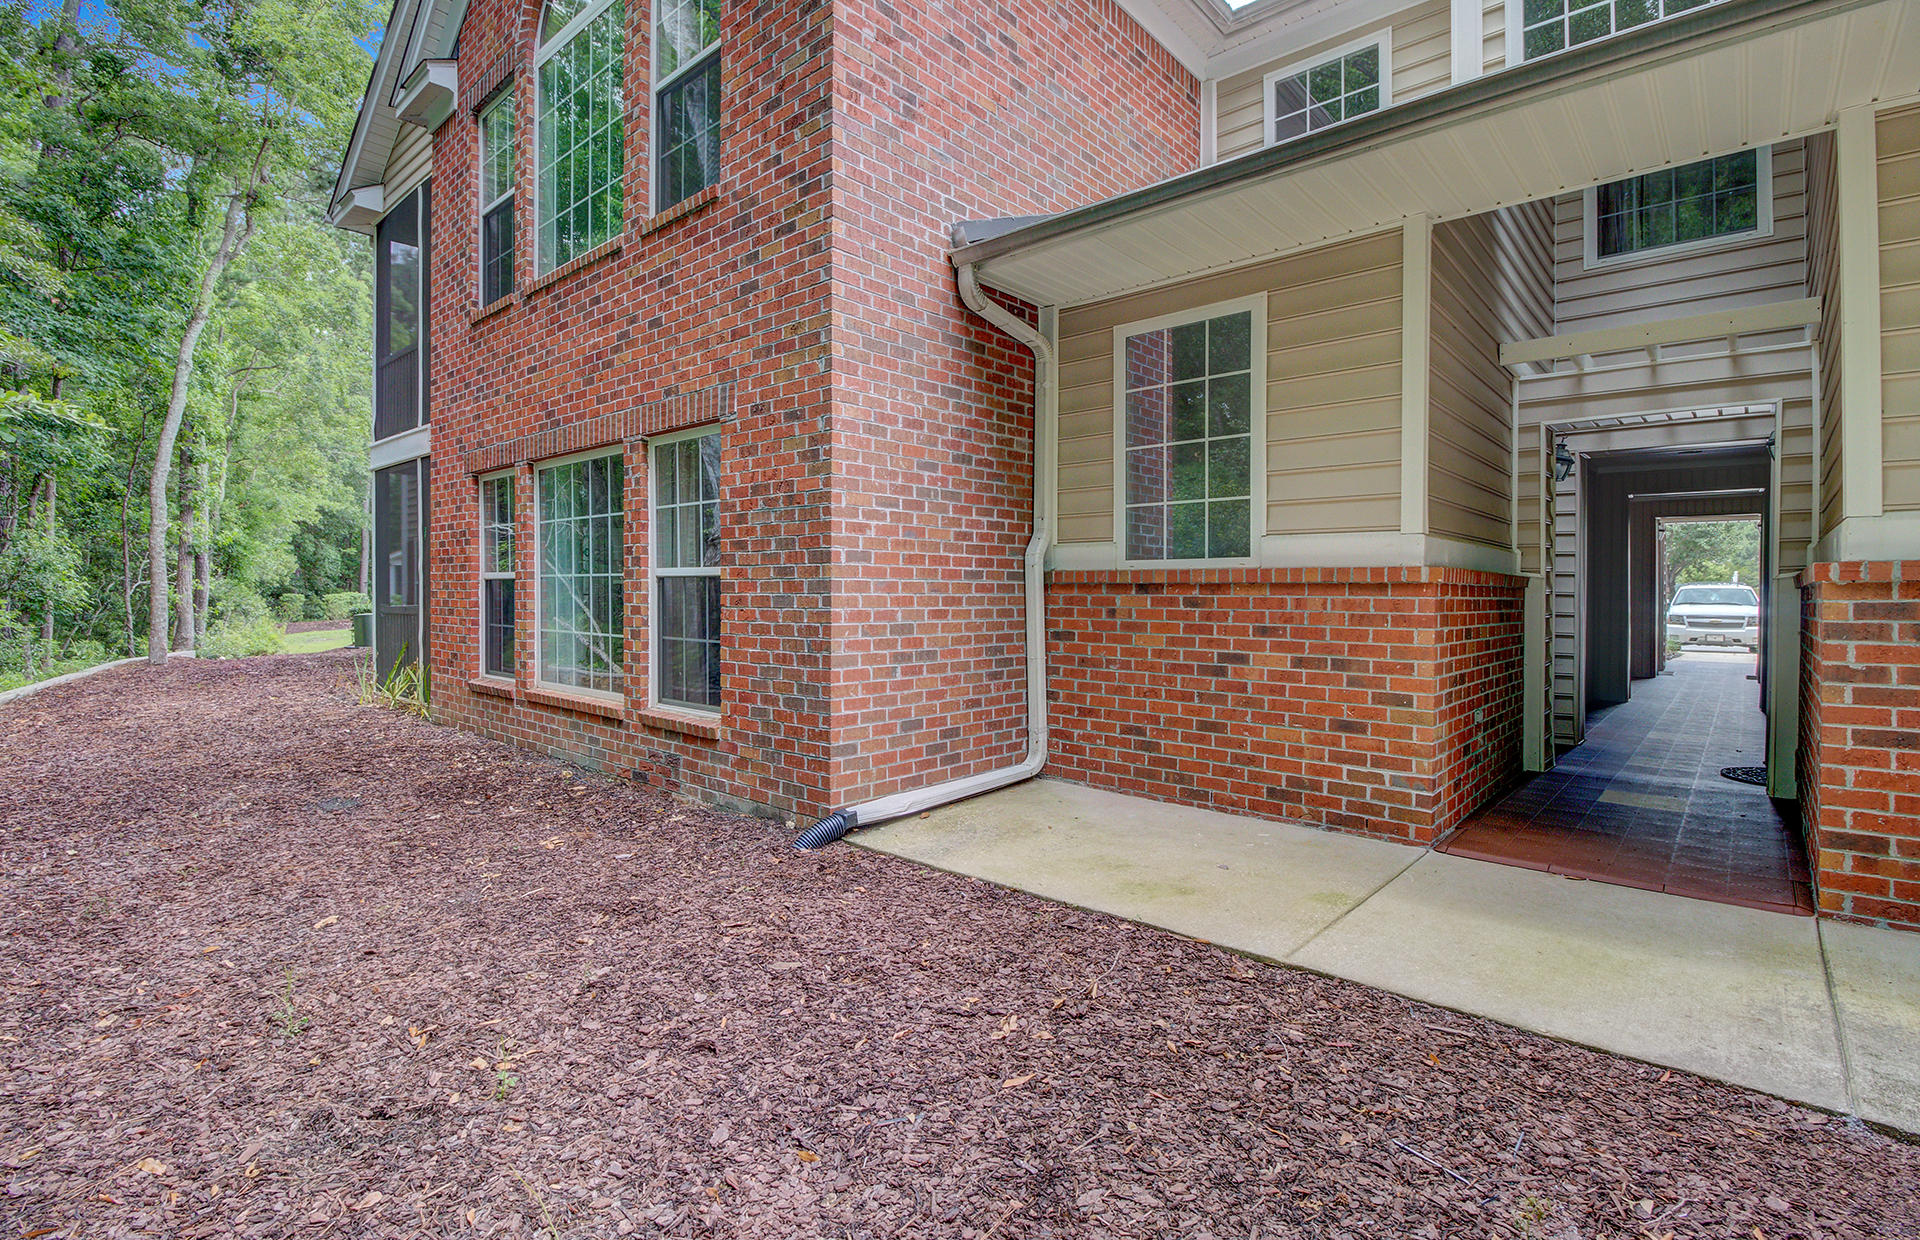 Dunes West Homes For Sale - 1566 Oxborough, Mount Pleasant, SC - 10